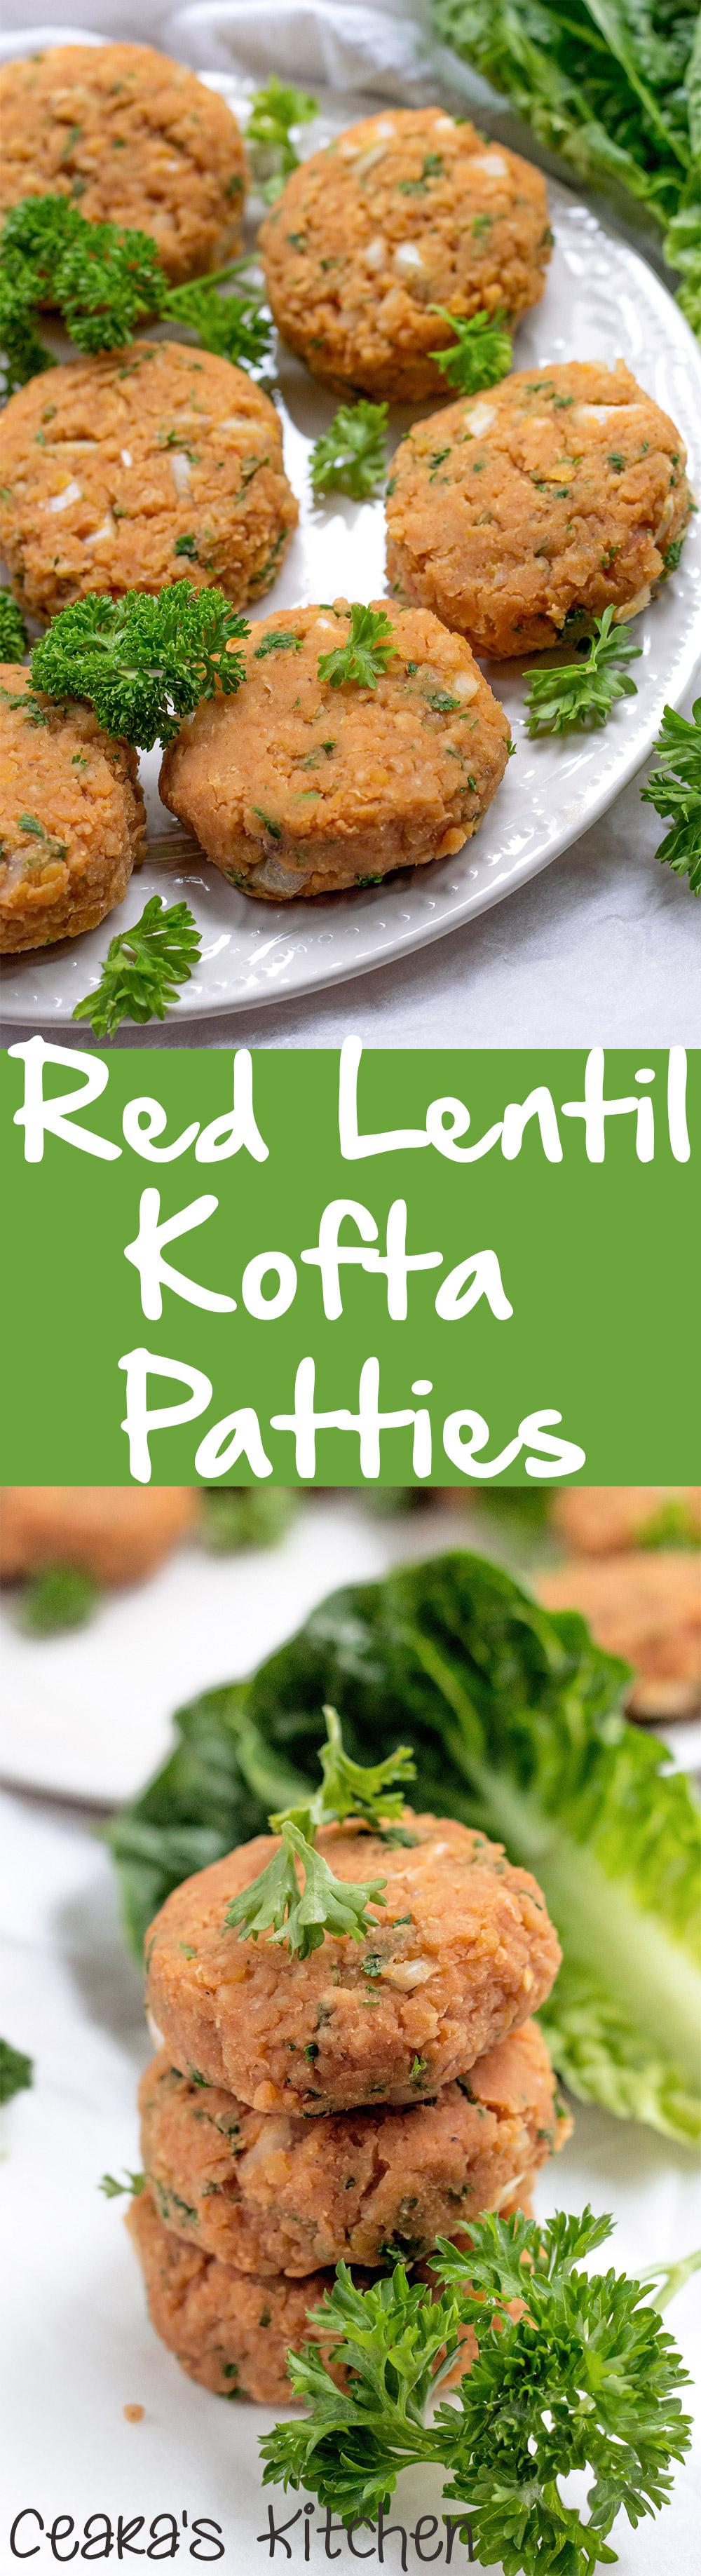 Red Lentil Kofta Patties